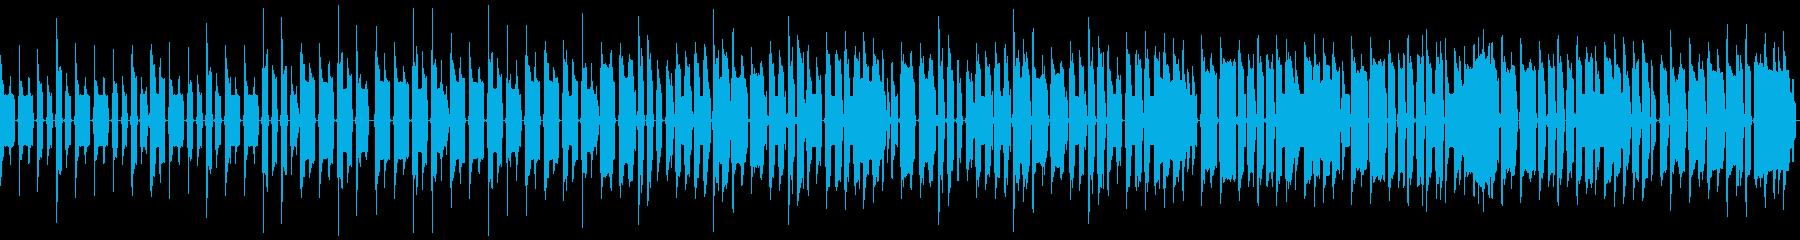 8bitでゆるい感じの始まりそうなBGMの再生済みの波形